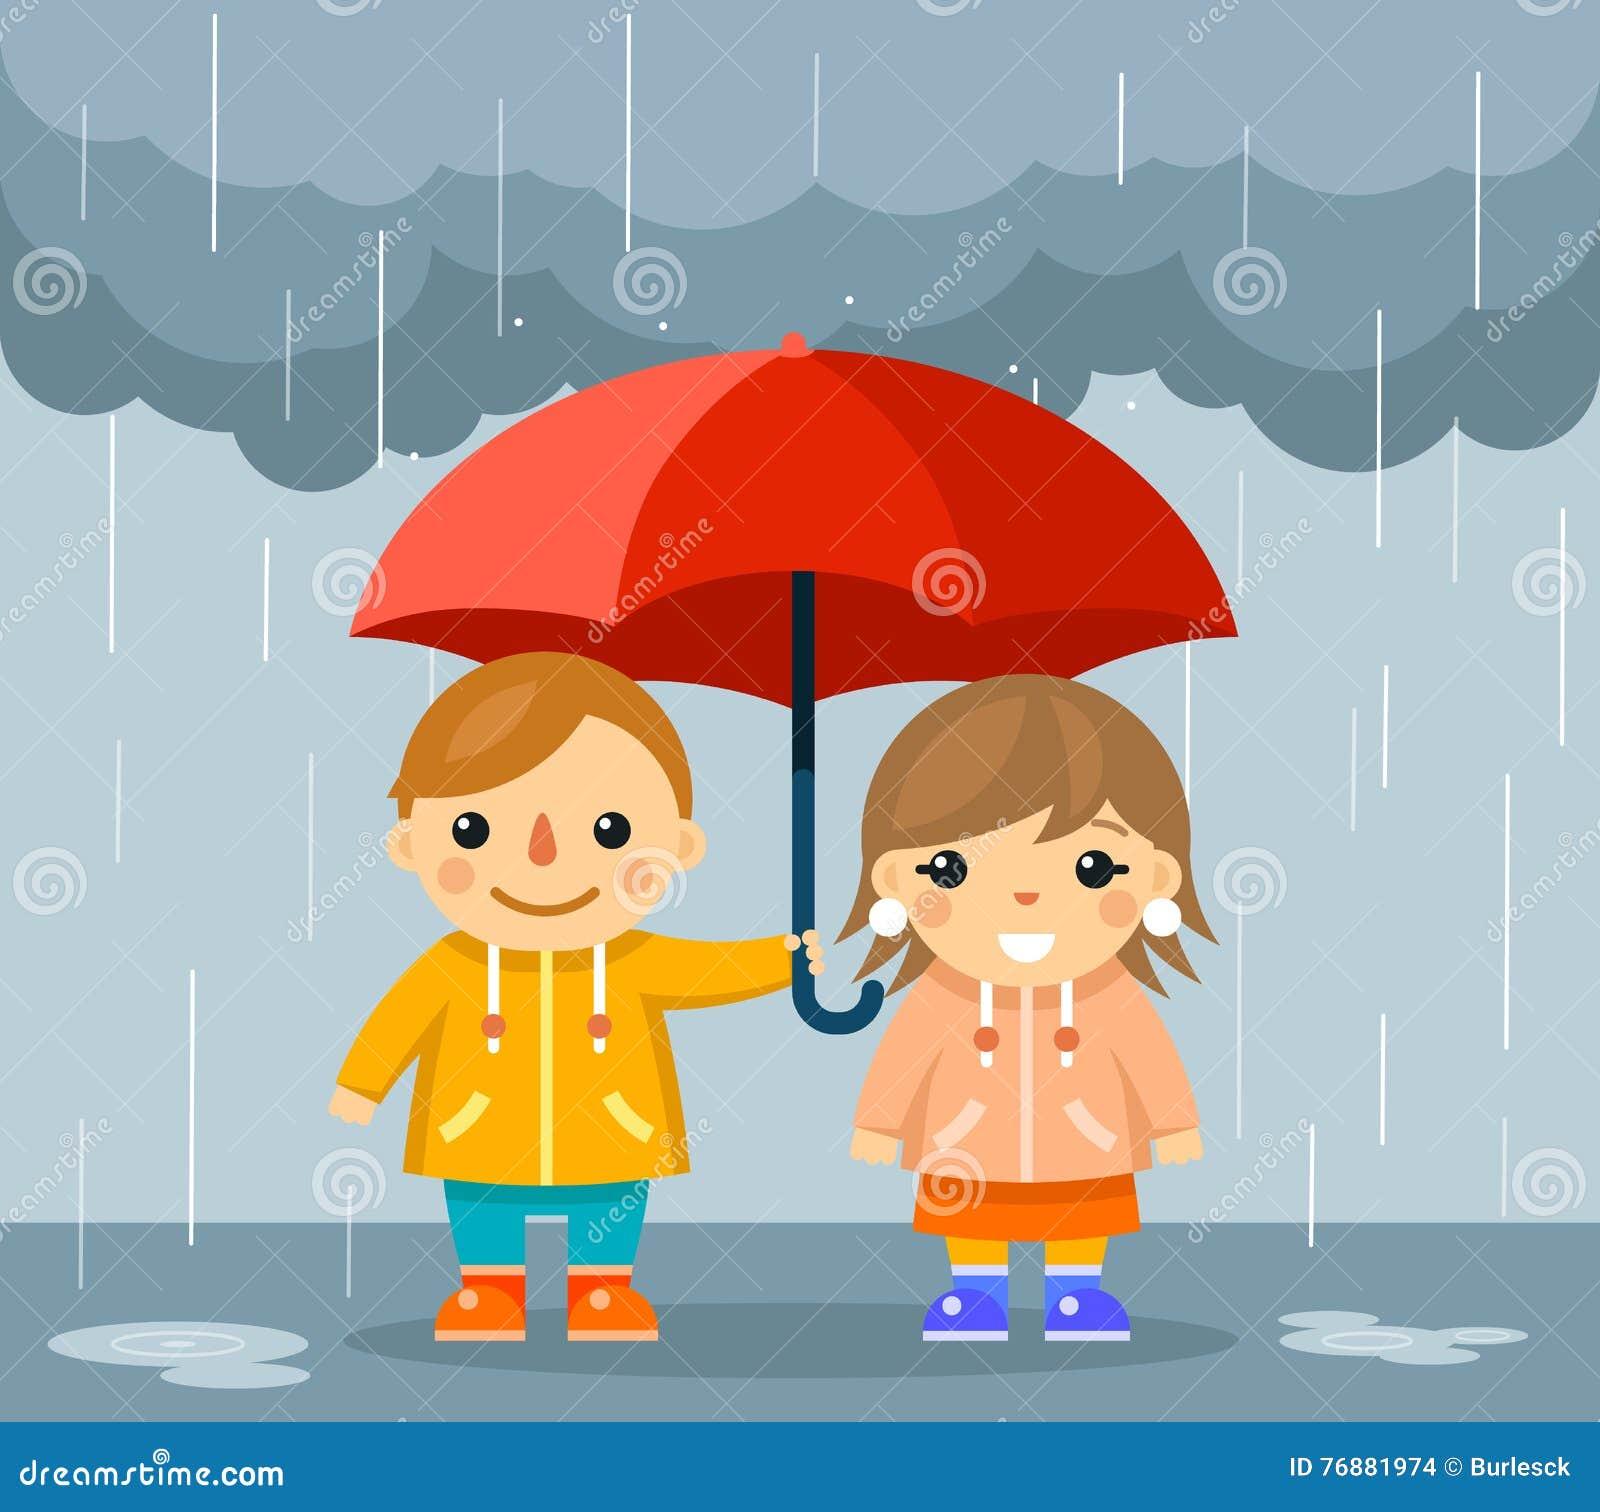 Boy Standing Under Umbrella In Rain Stock Photography ...